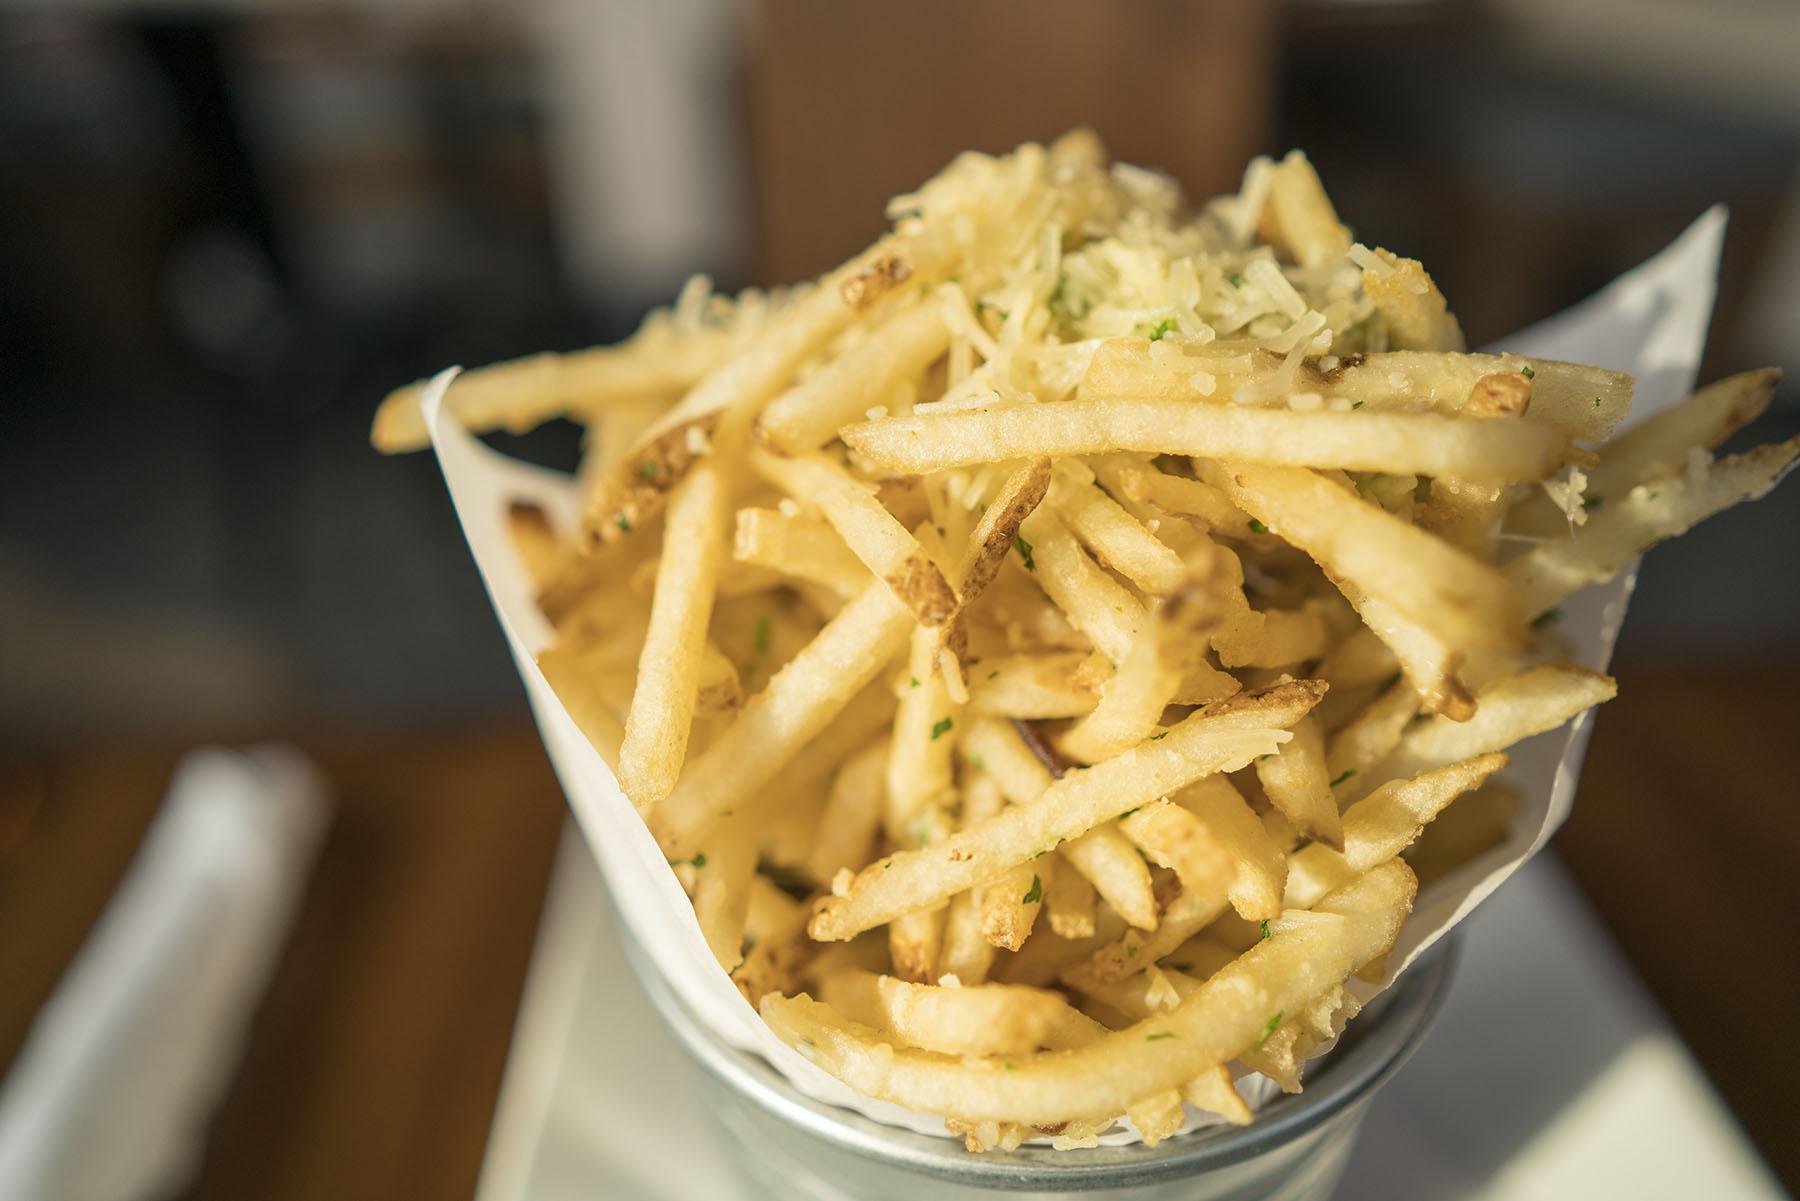 Copy of Truffle Parmesan Fries